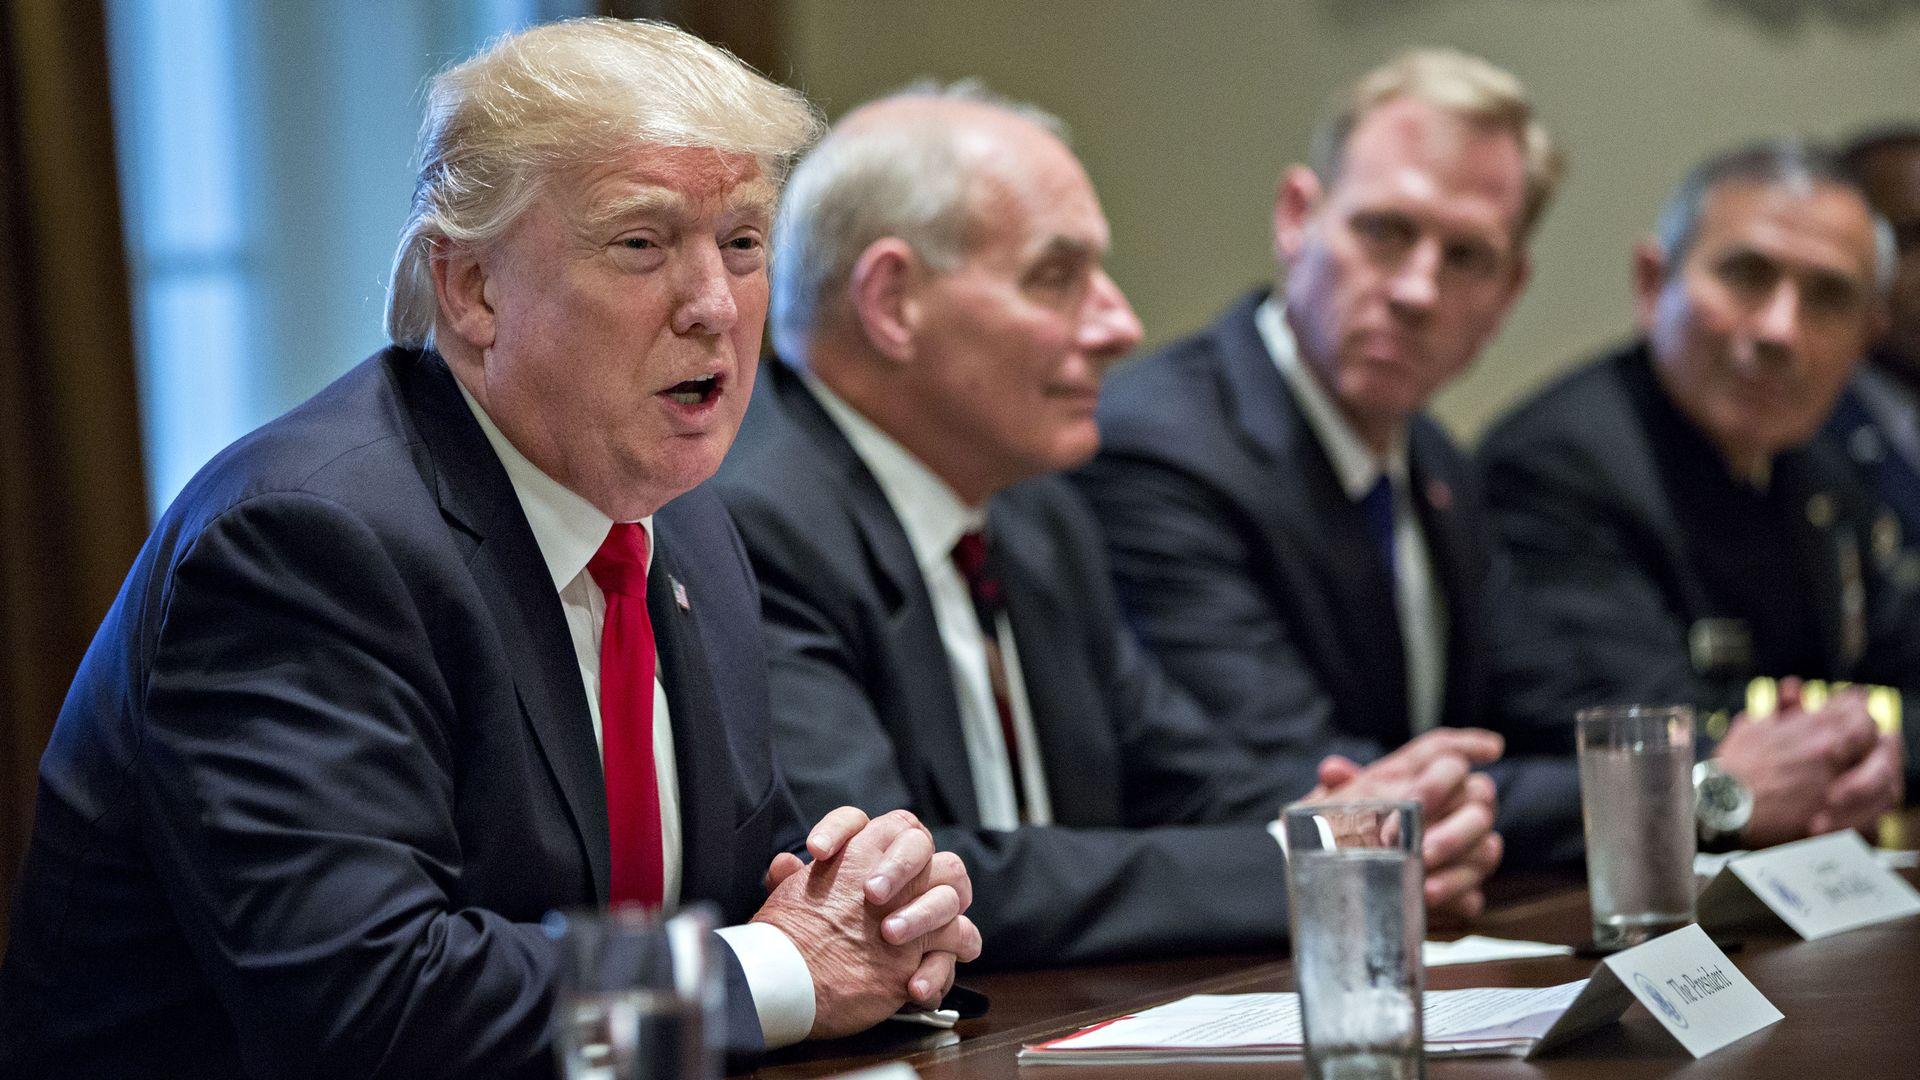 Donald Trump at a meeting